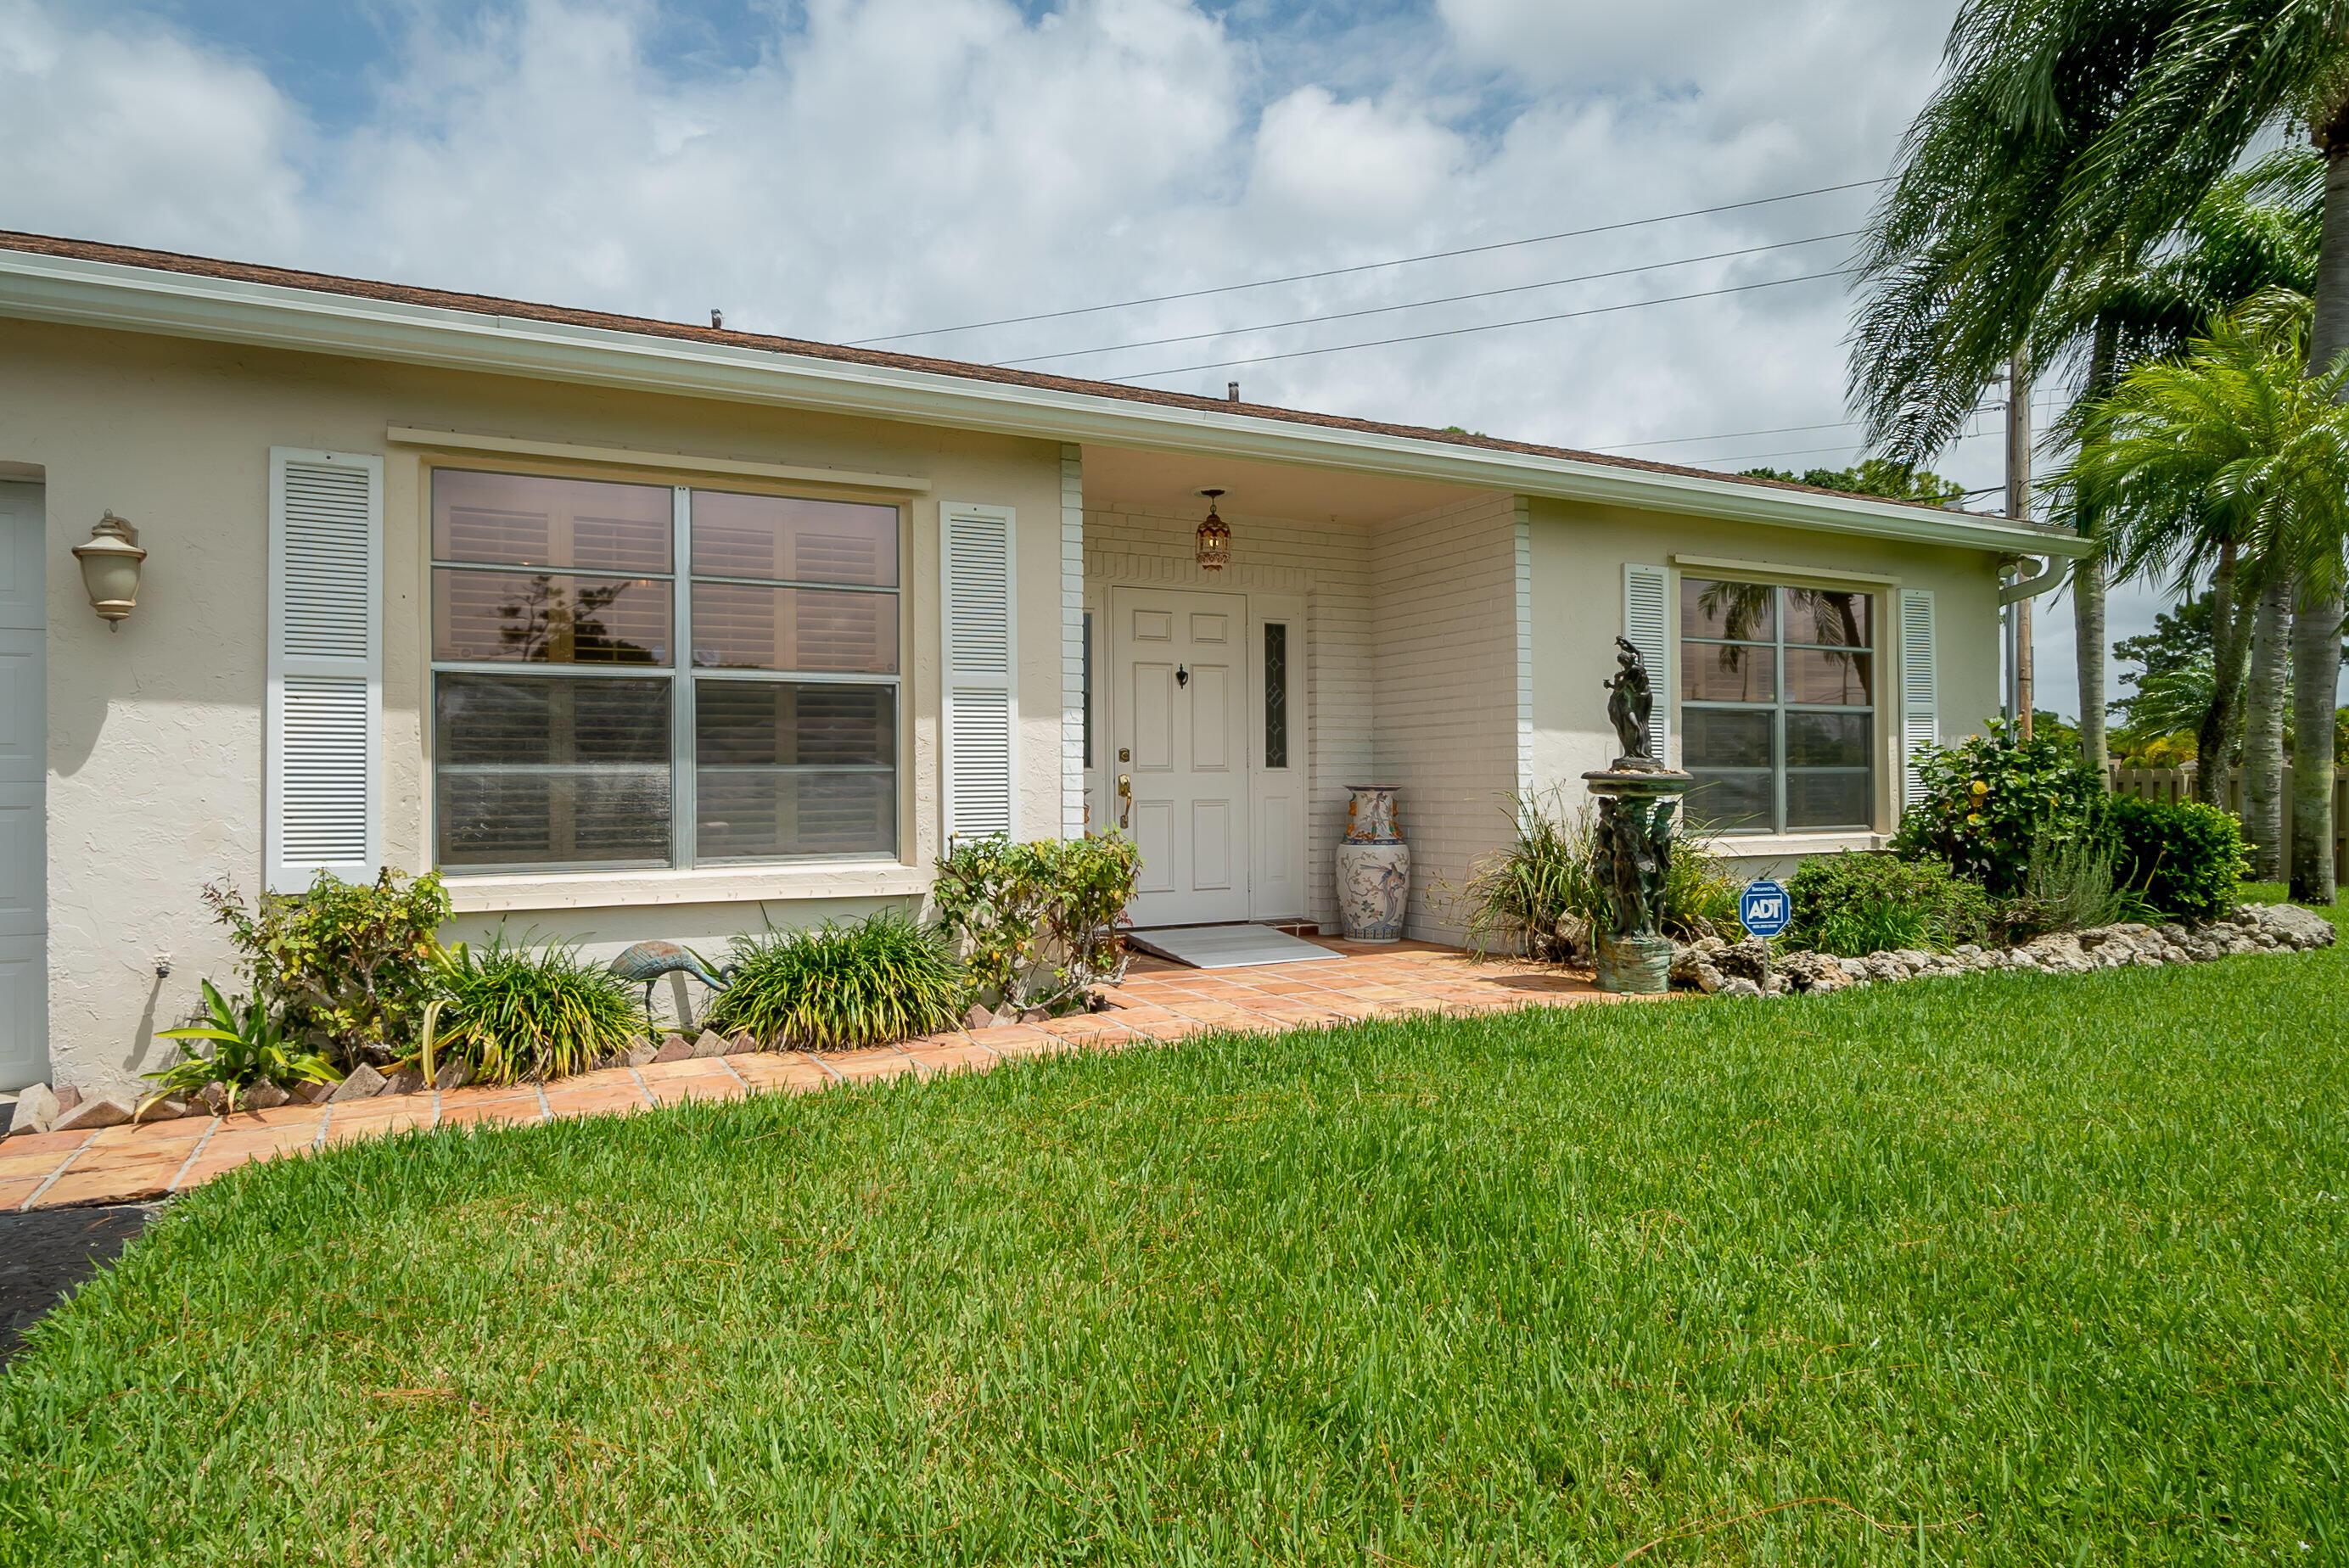 4701 Rainbow Drive, Greenacres, Florida 33463, 2 Bedrooms Bedrooms, ,2 BathroomsBathrooms,A,Single family,Rainbow,RX-10731060